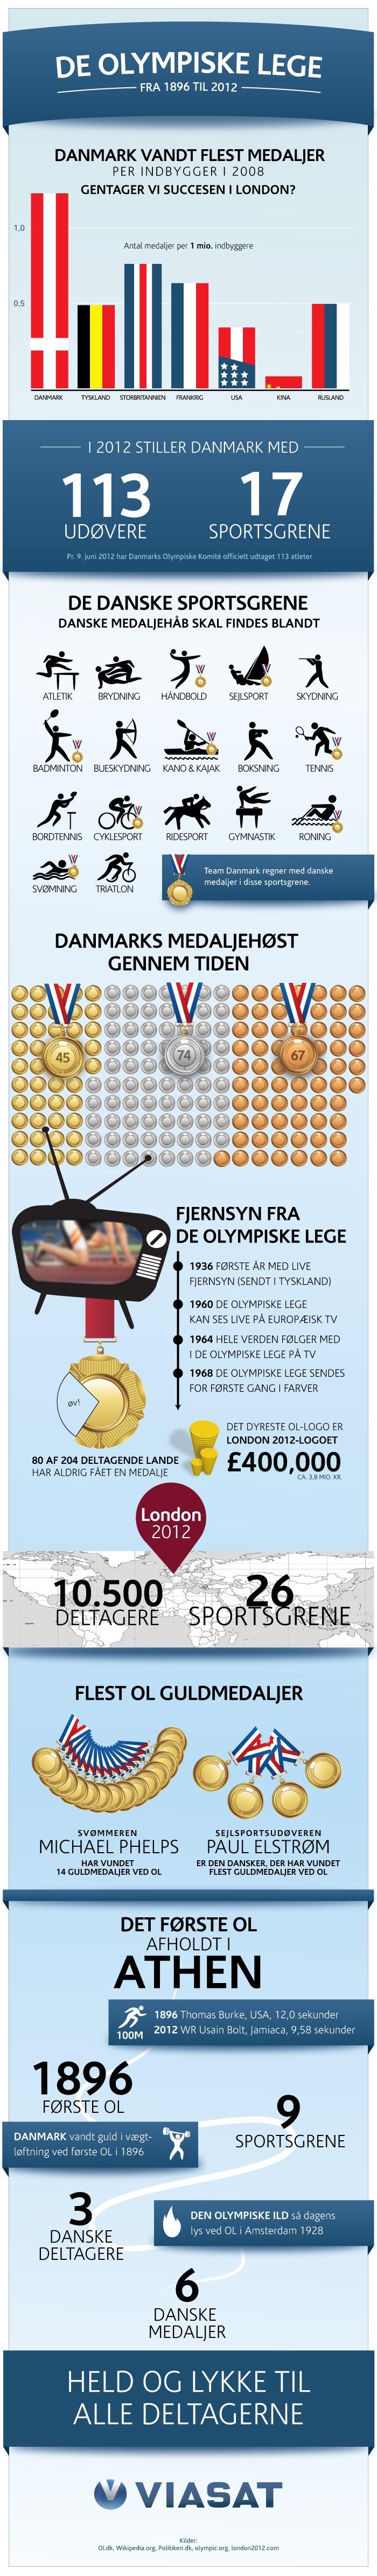 Held og lykke til de danske ol deltagere